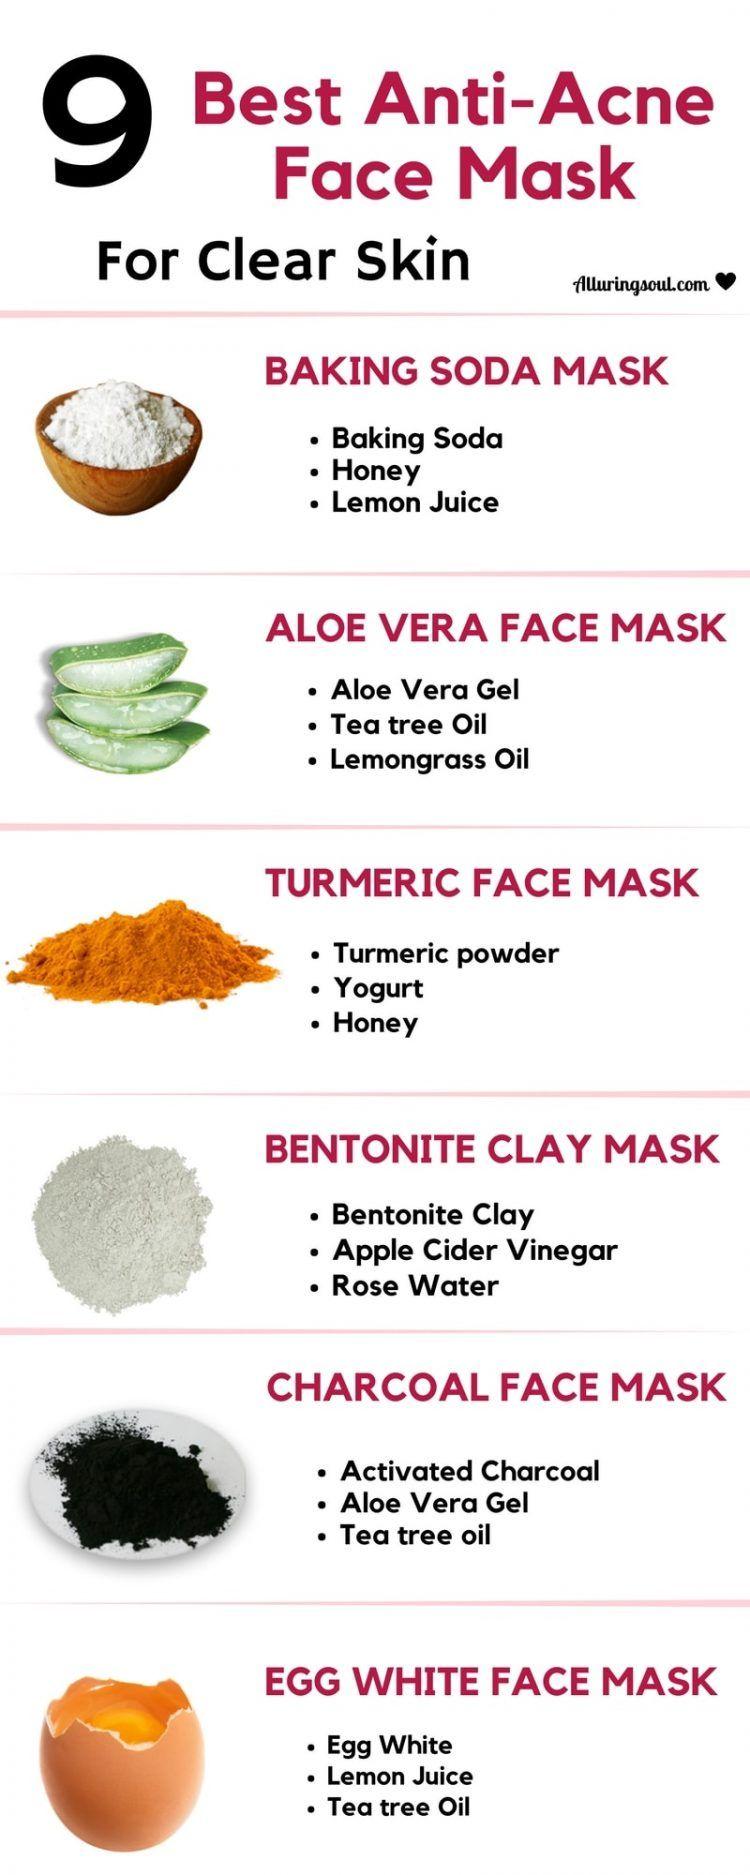 acne face mask Acne face mask